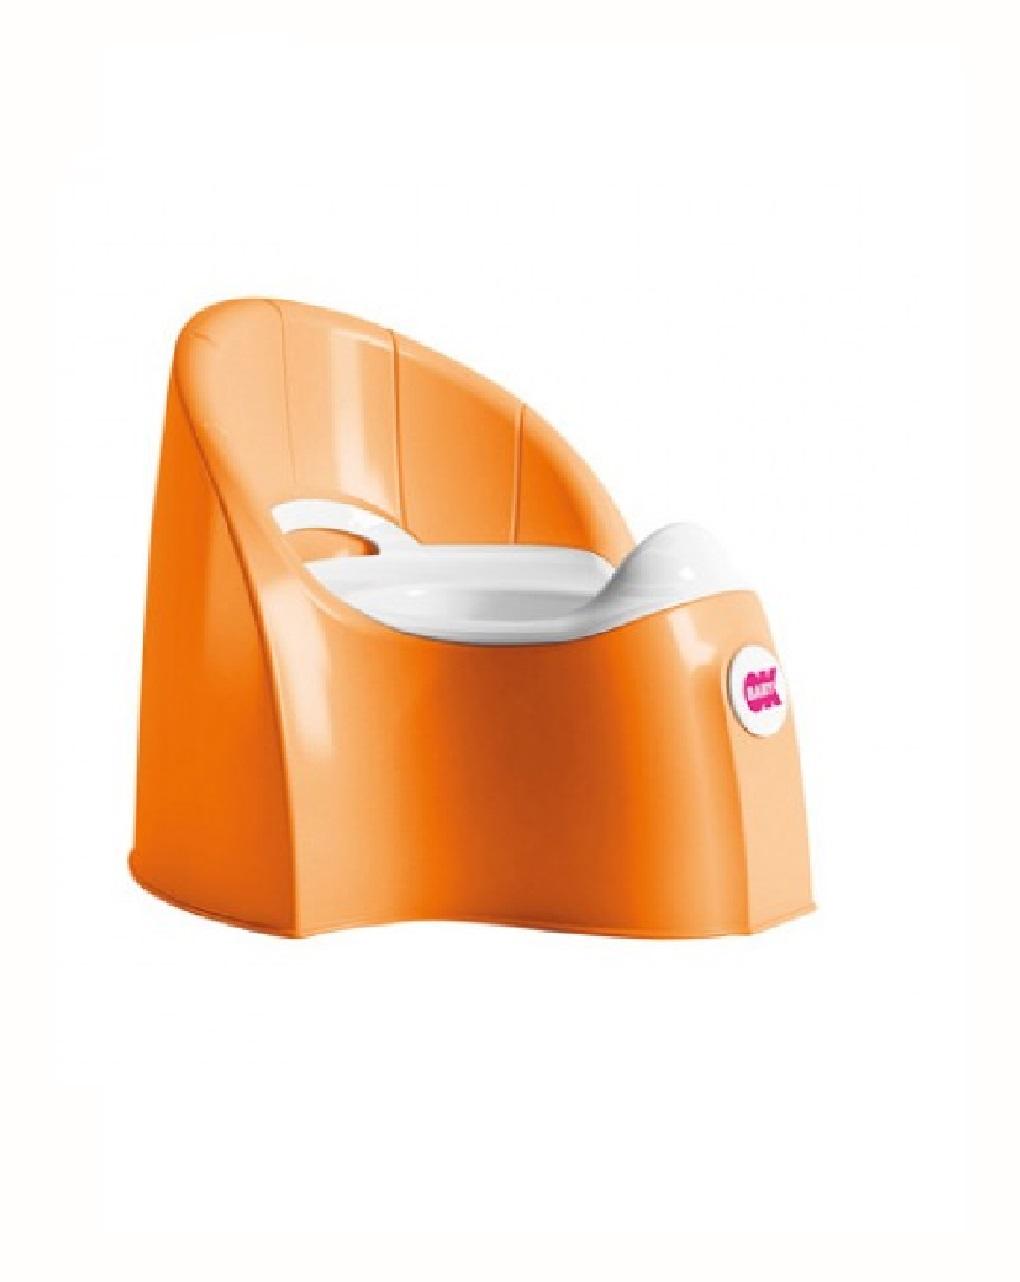 Potty pasha laranja - Okbaby